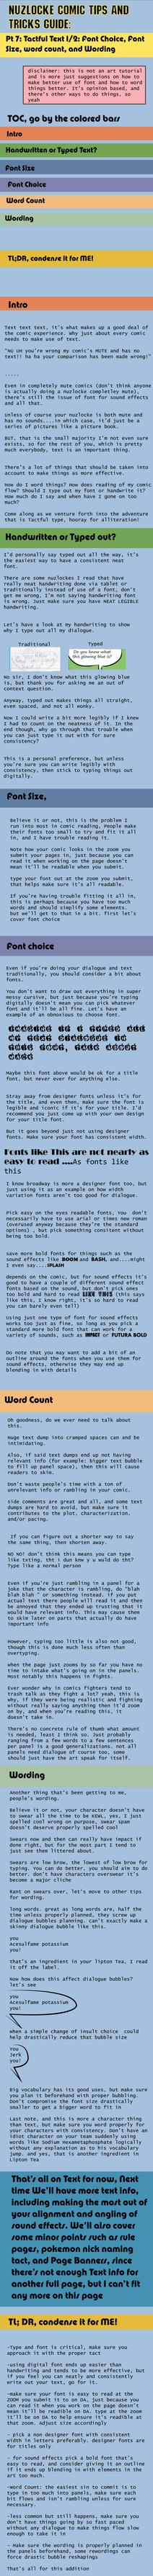 Nuzlocke Comics Guide: Text pt 1 by OddPenguin